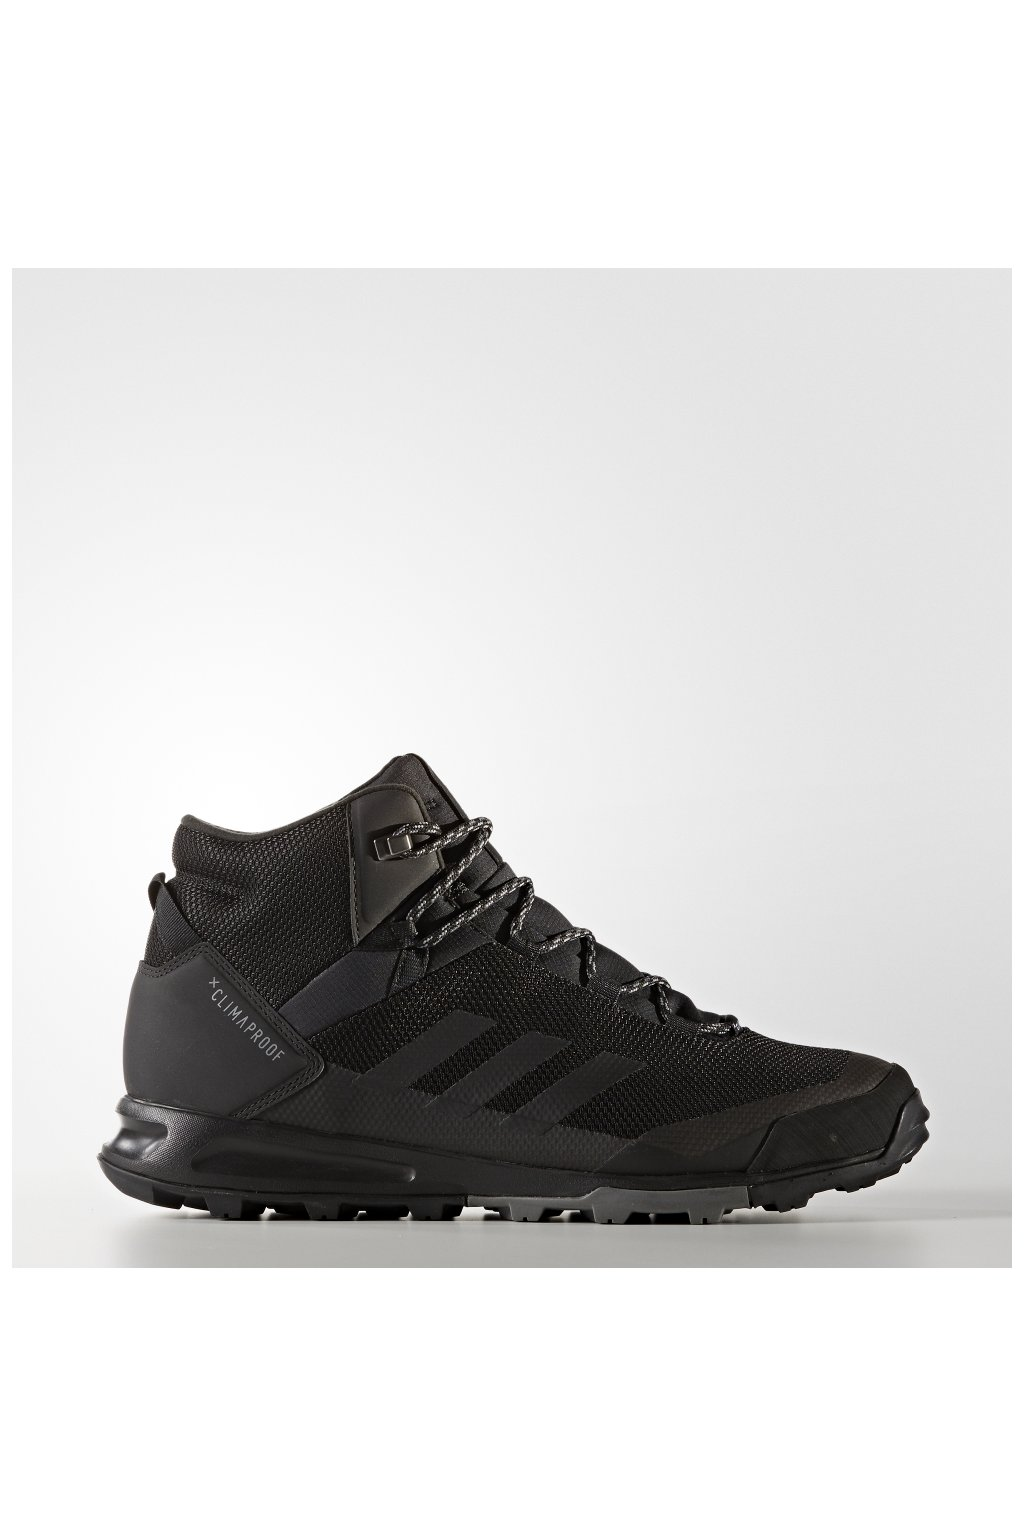 s80935 trekove topanky adidas terrex tivid mid (1)